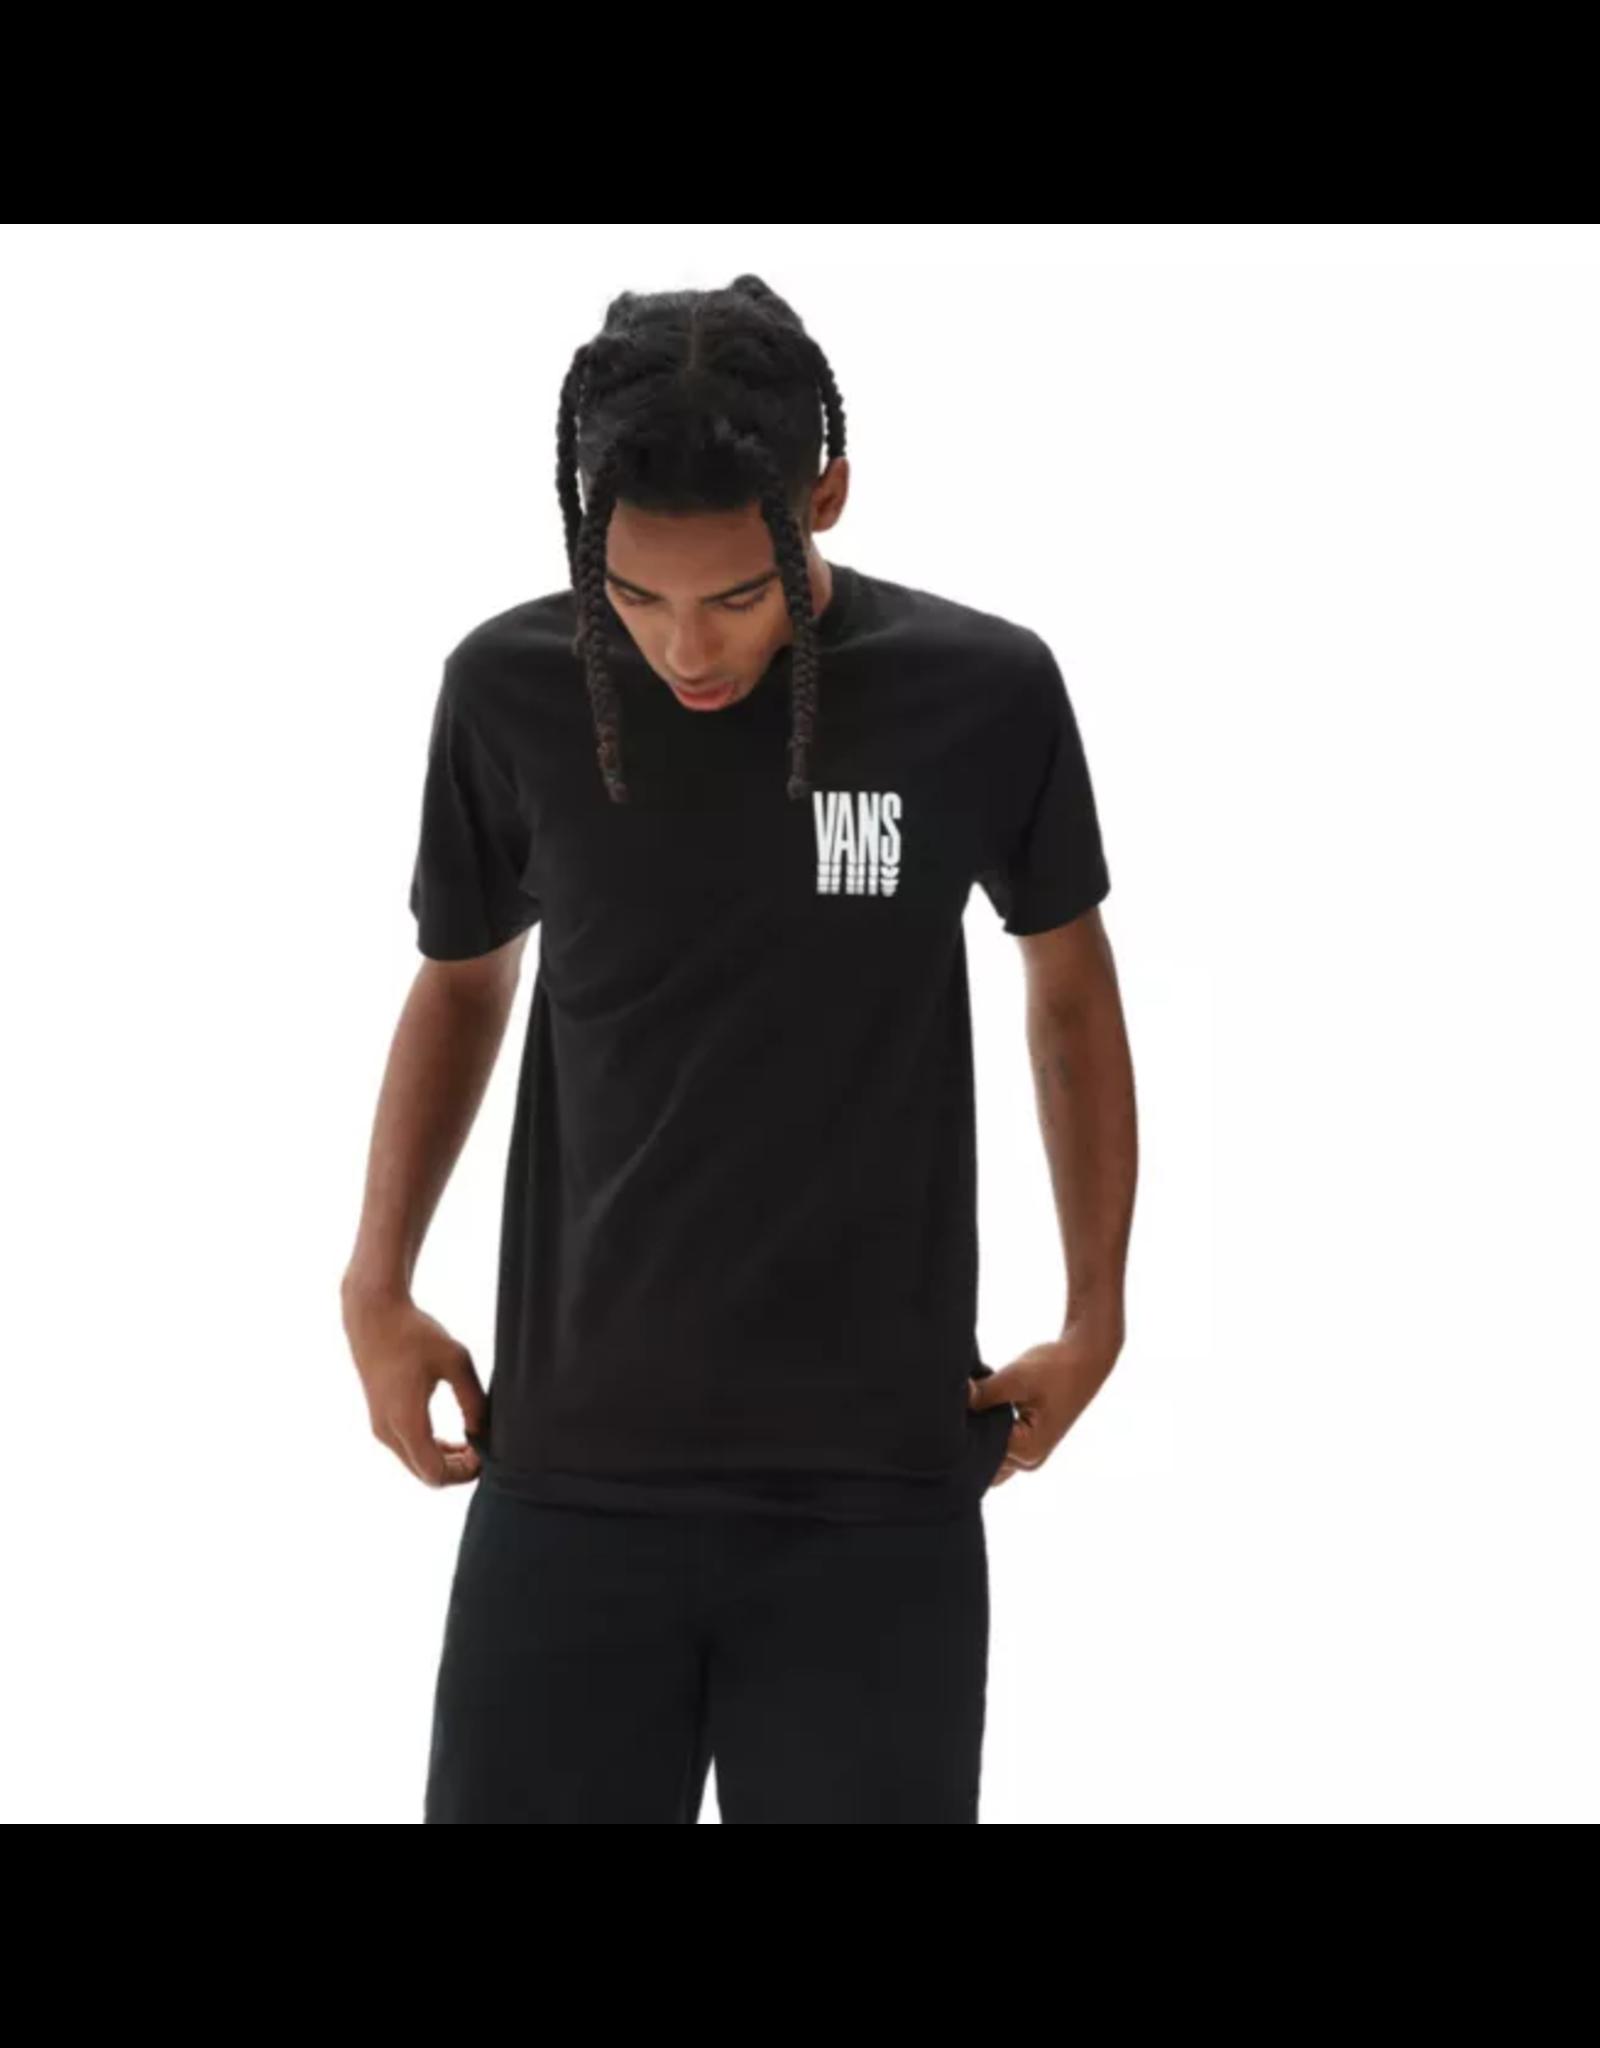 vans Vans- T-shirt homme reflect black